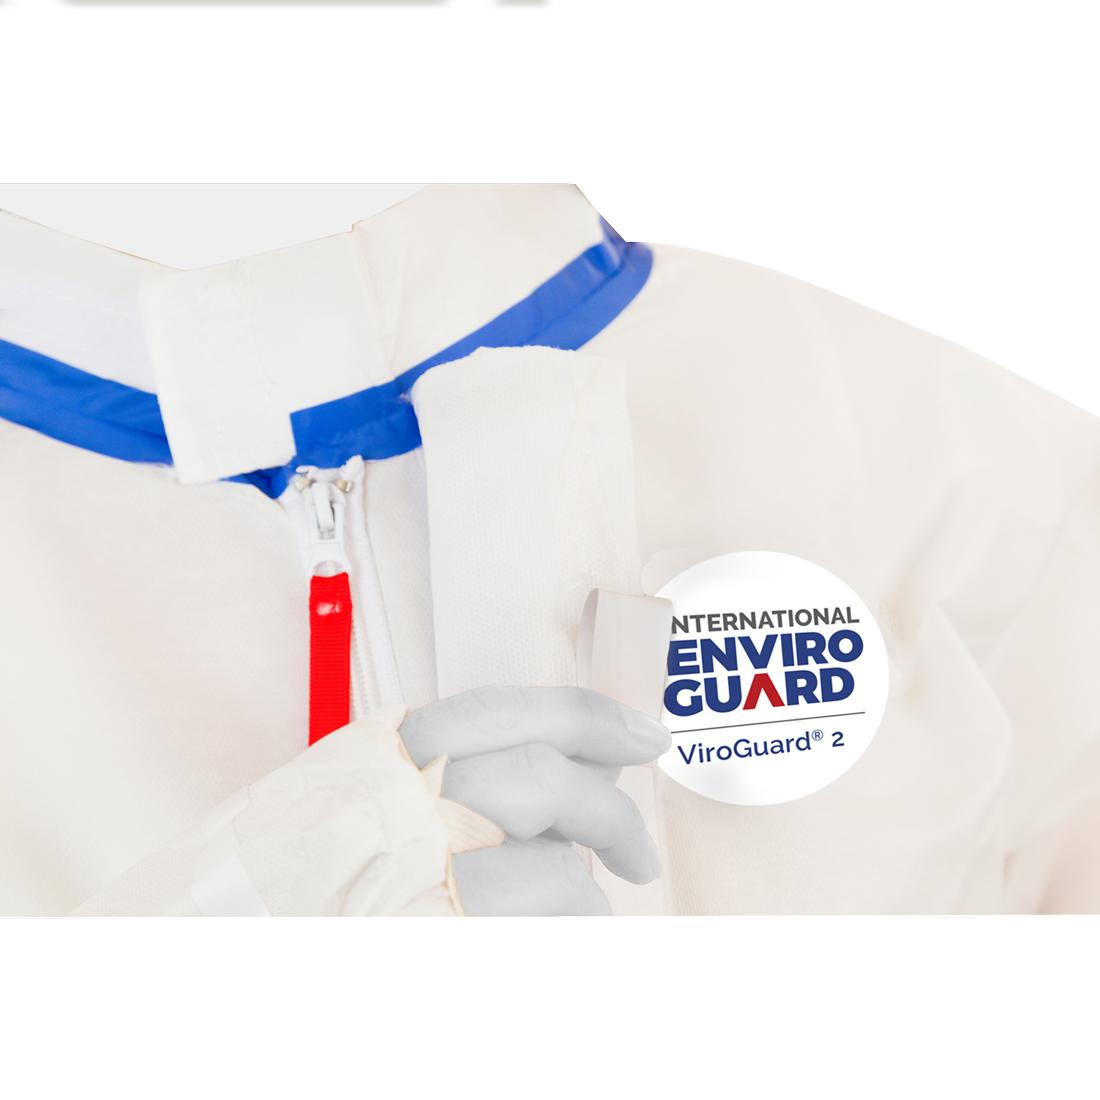 International Enviroguard ViroGuard® 2 Coverall